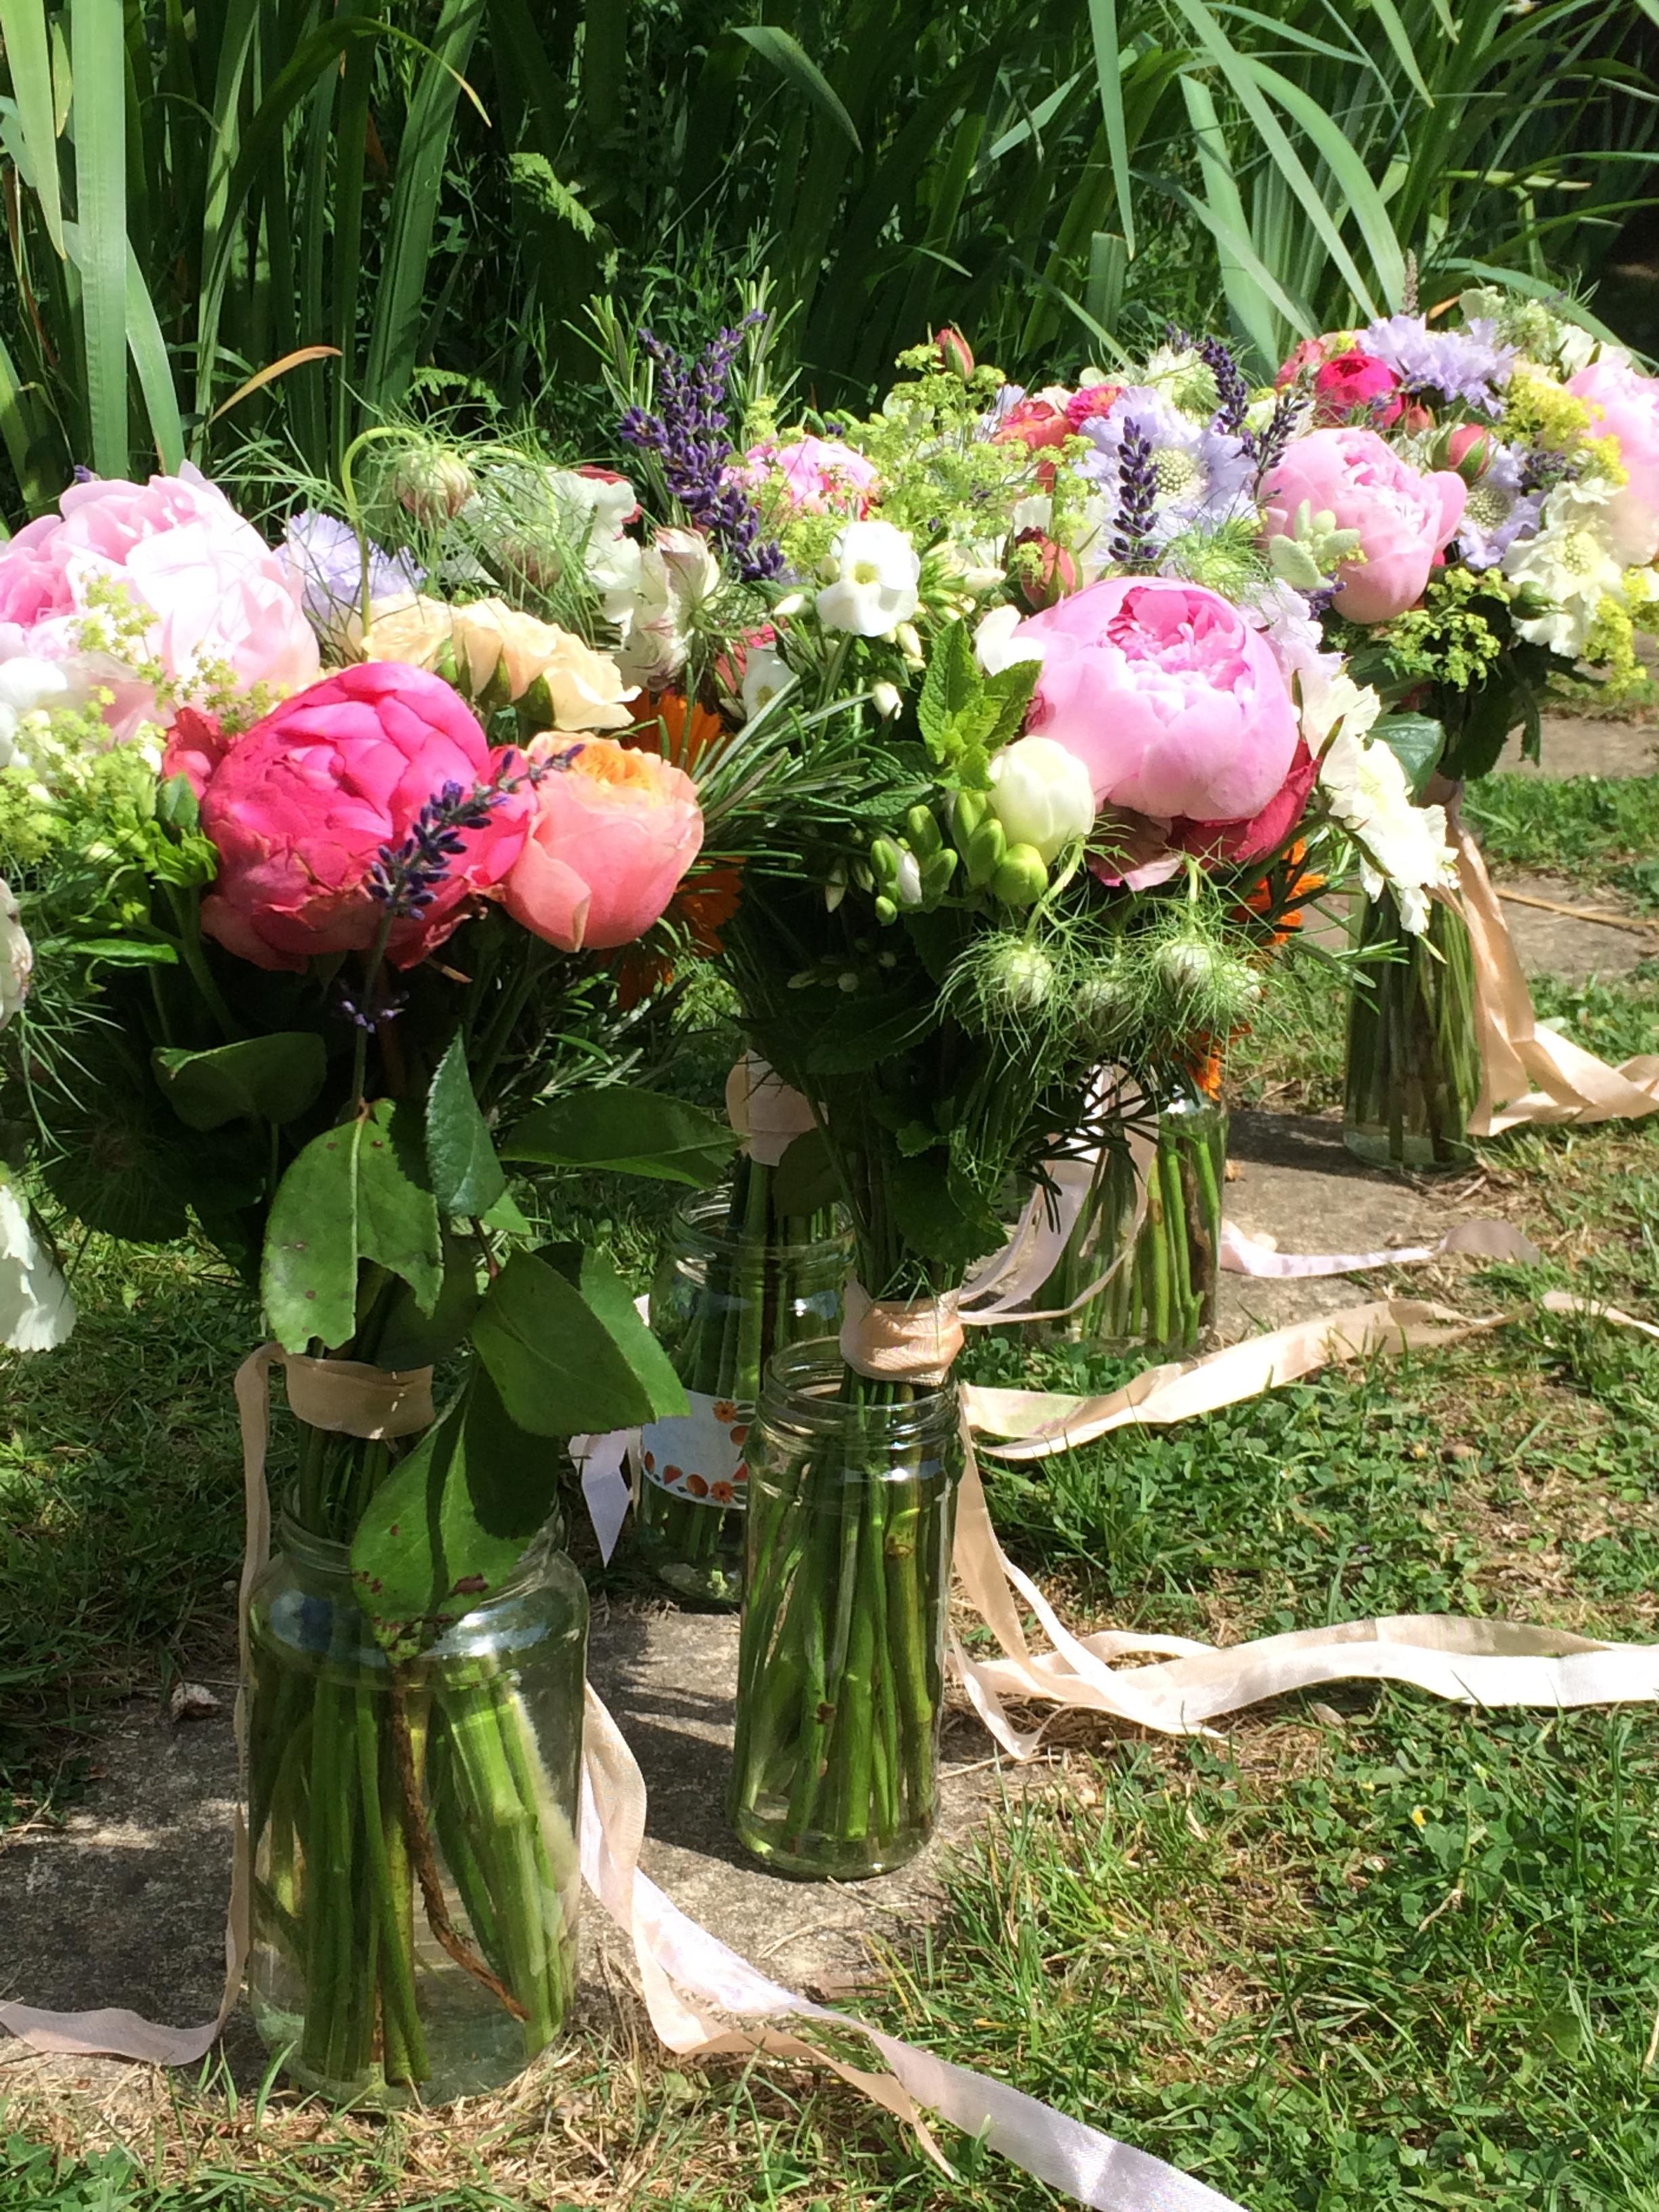 peonies roses wild garden english flowers